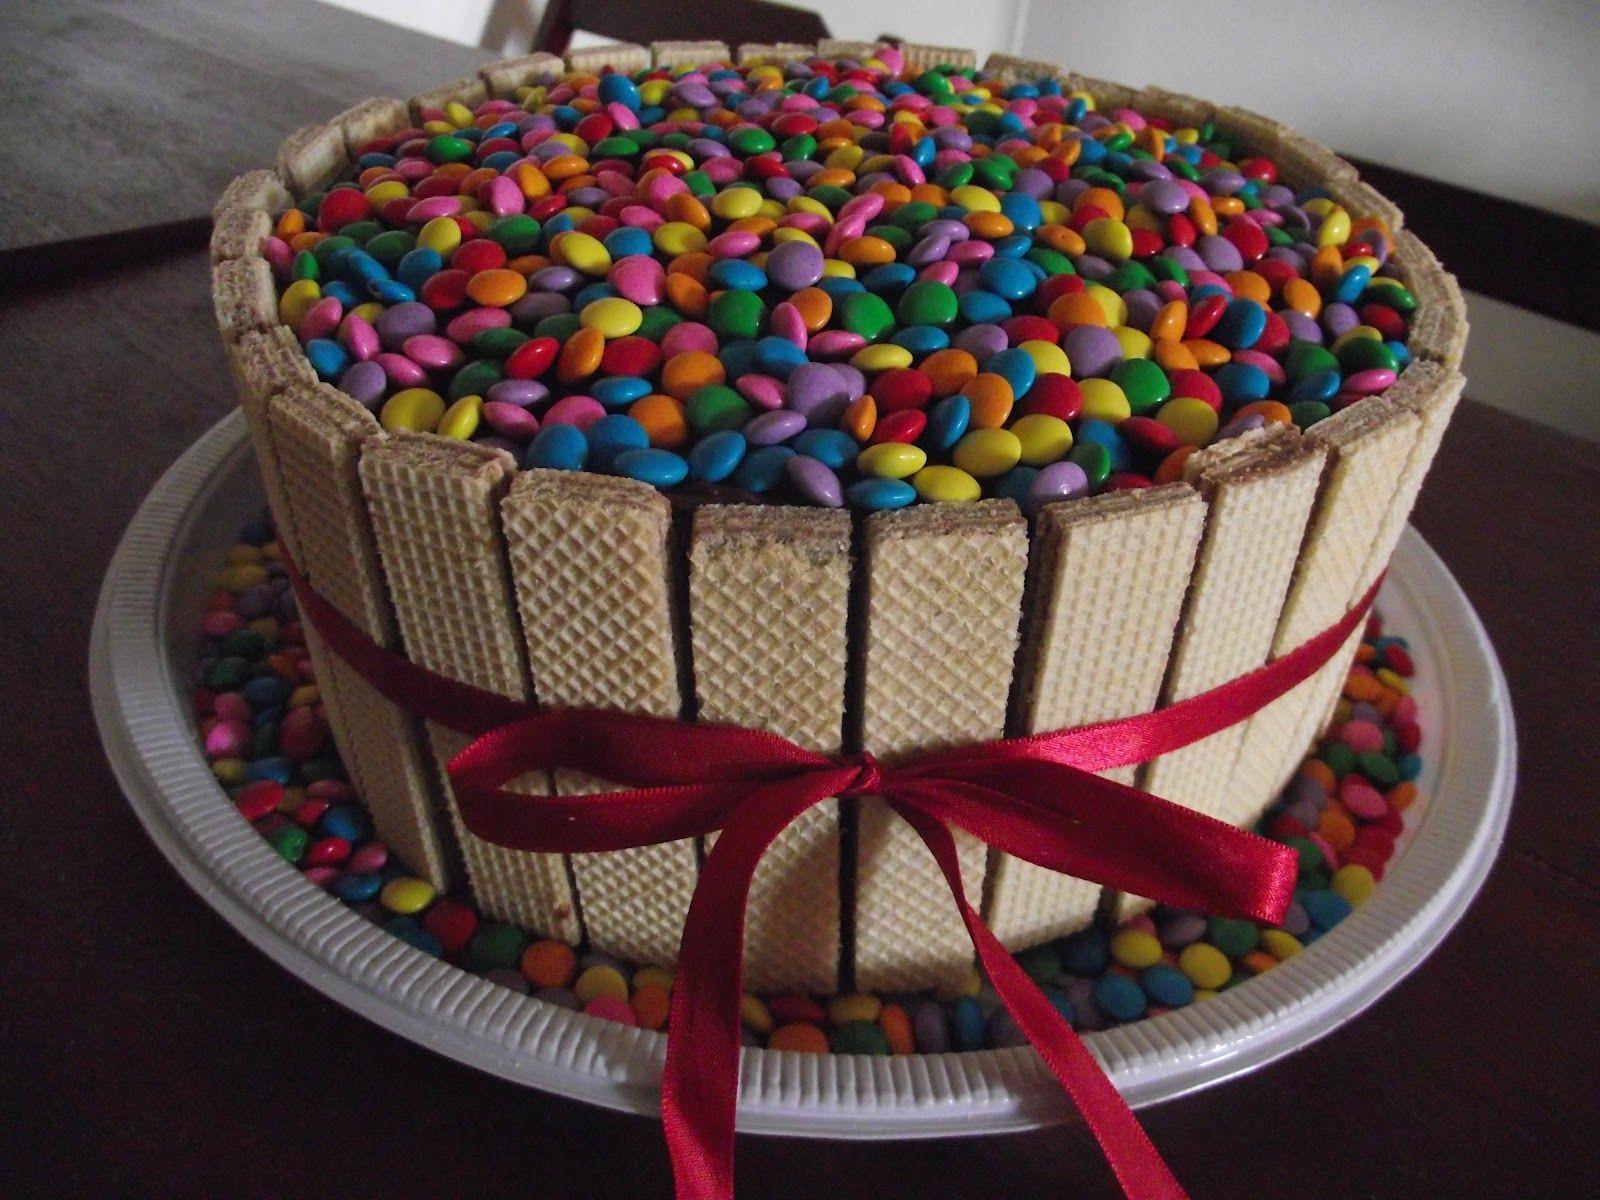 Funky Cakes And Treats Richards Bay